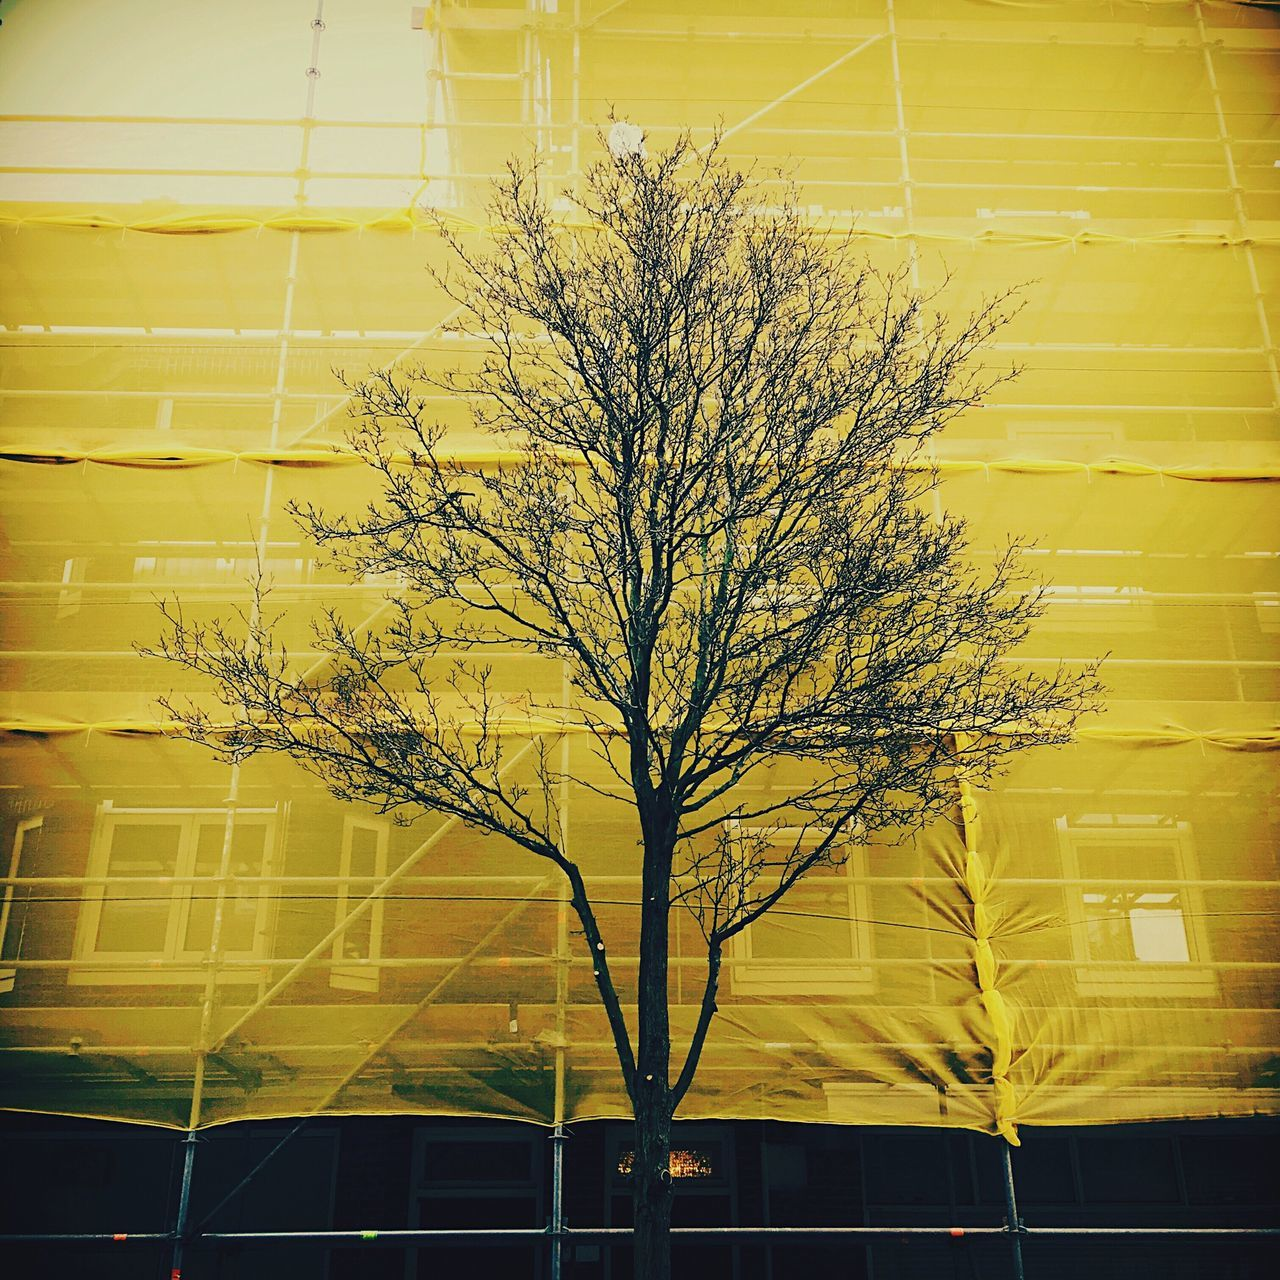 Tree Background Background Texture Background Color Renovation Safety Urbanphotography Urban Nature Scaffolding Scaffold Net Color Palette